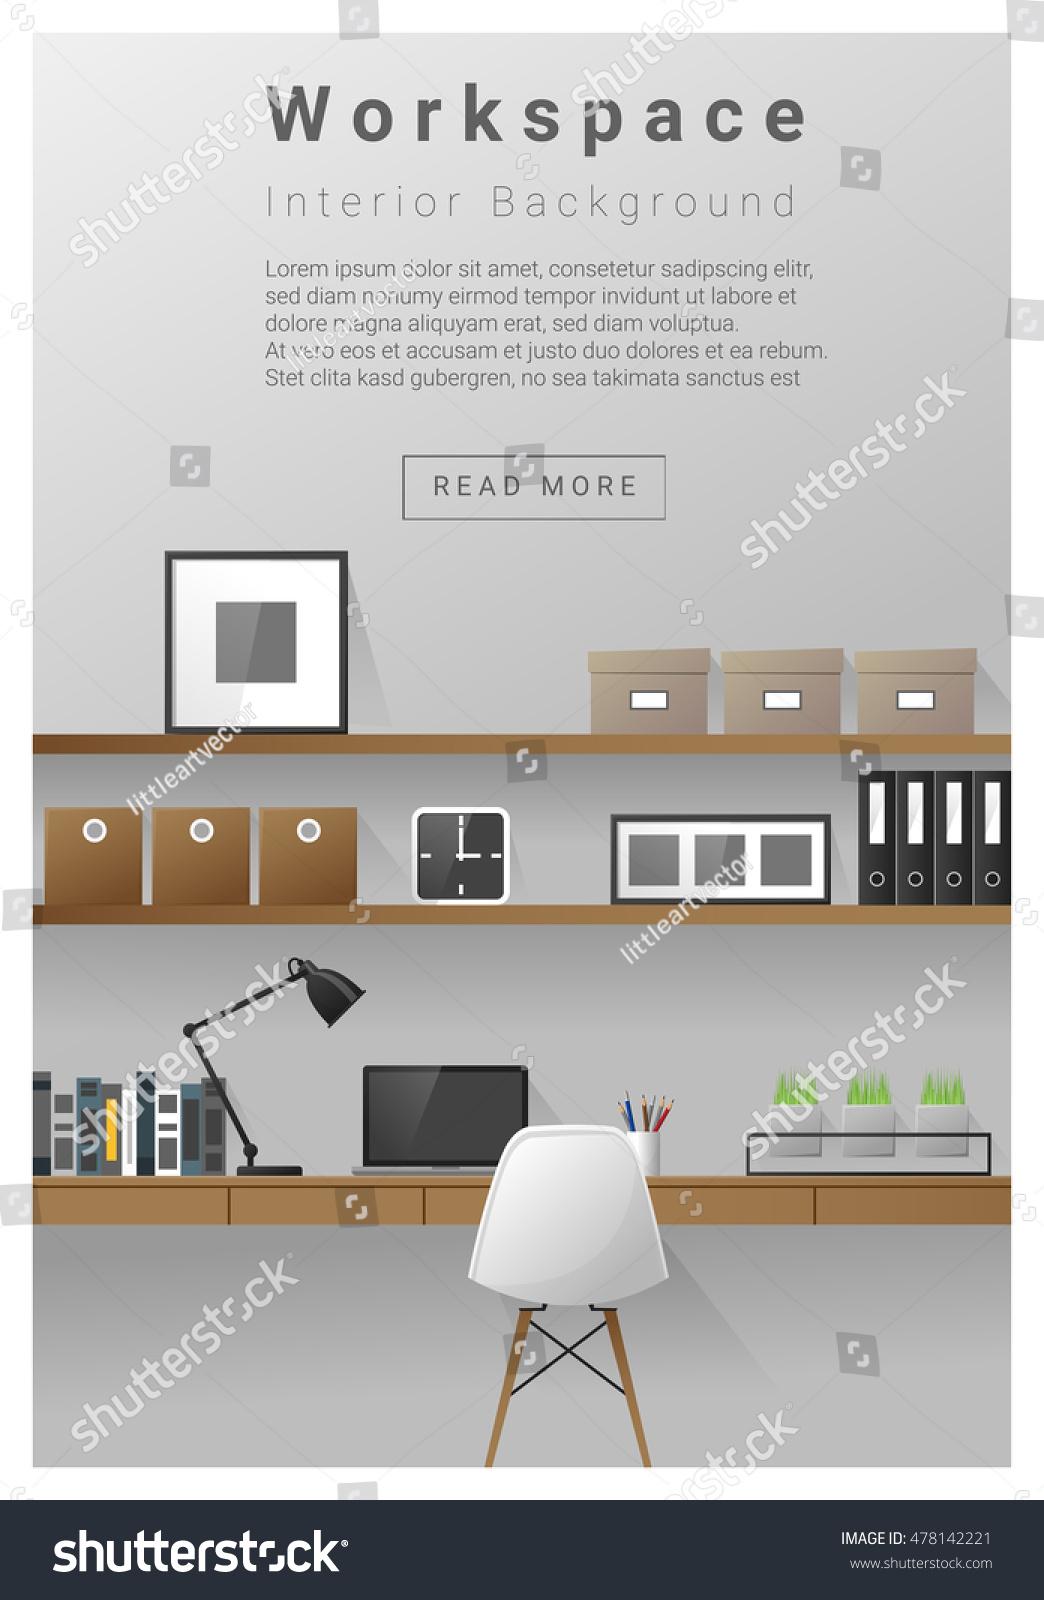 Interior design modern workspace banner vector stock for Interior design banner images